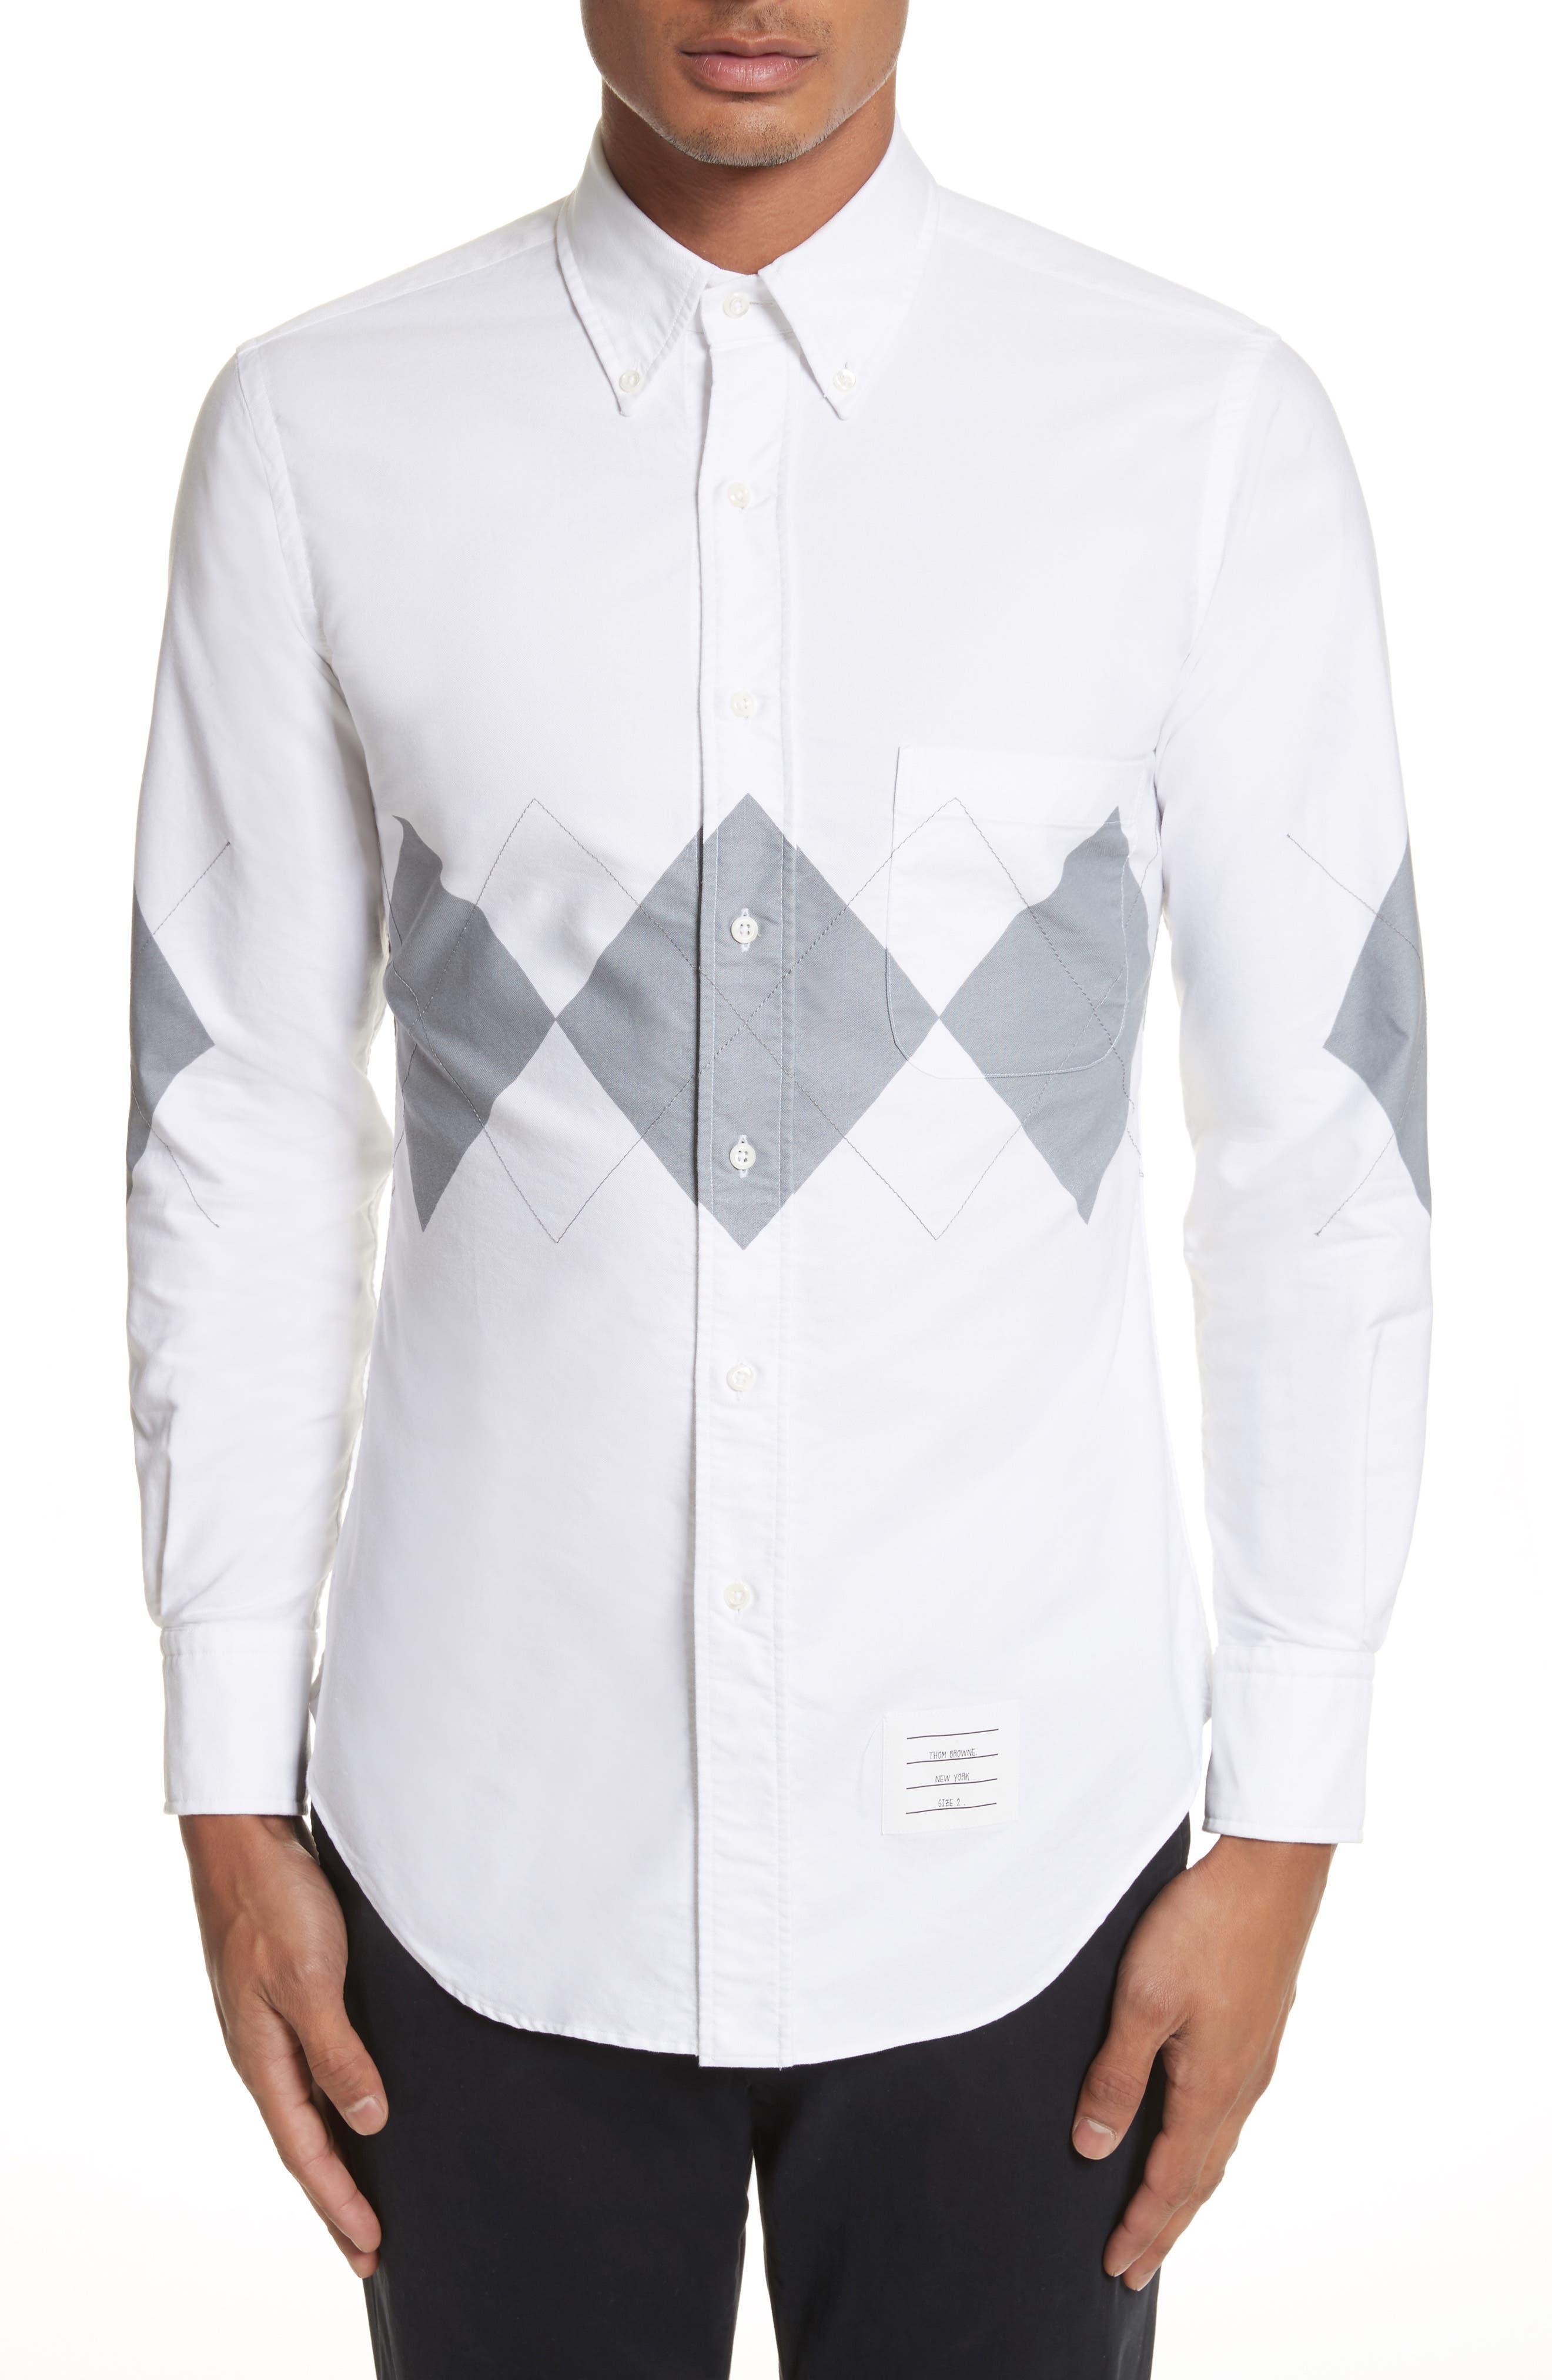 Main Image - Thom Browne Argyle Print Woven Shirt